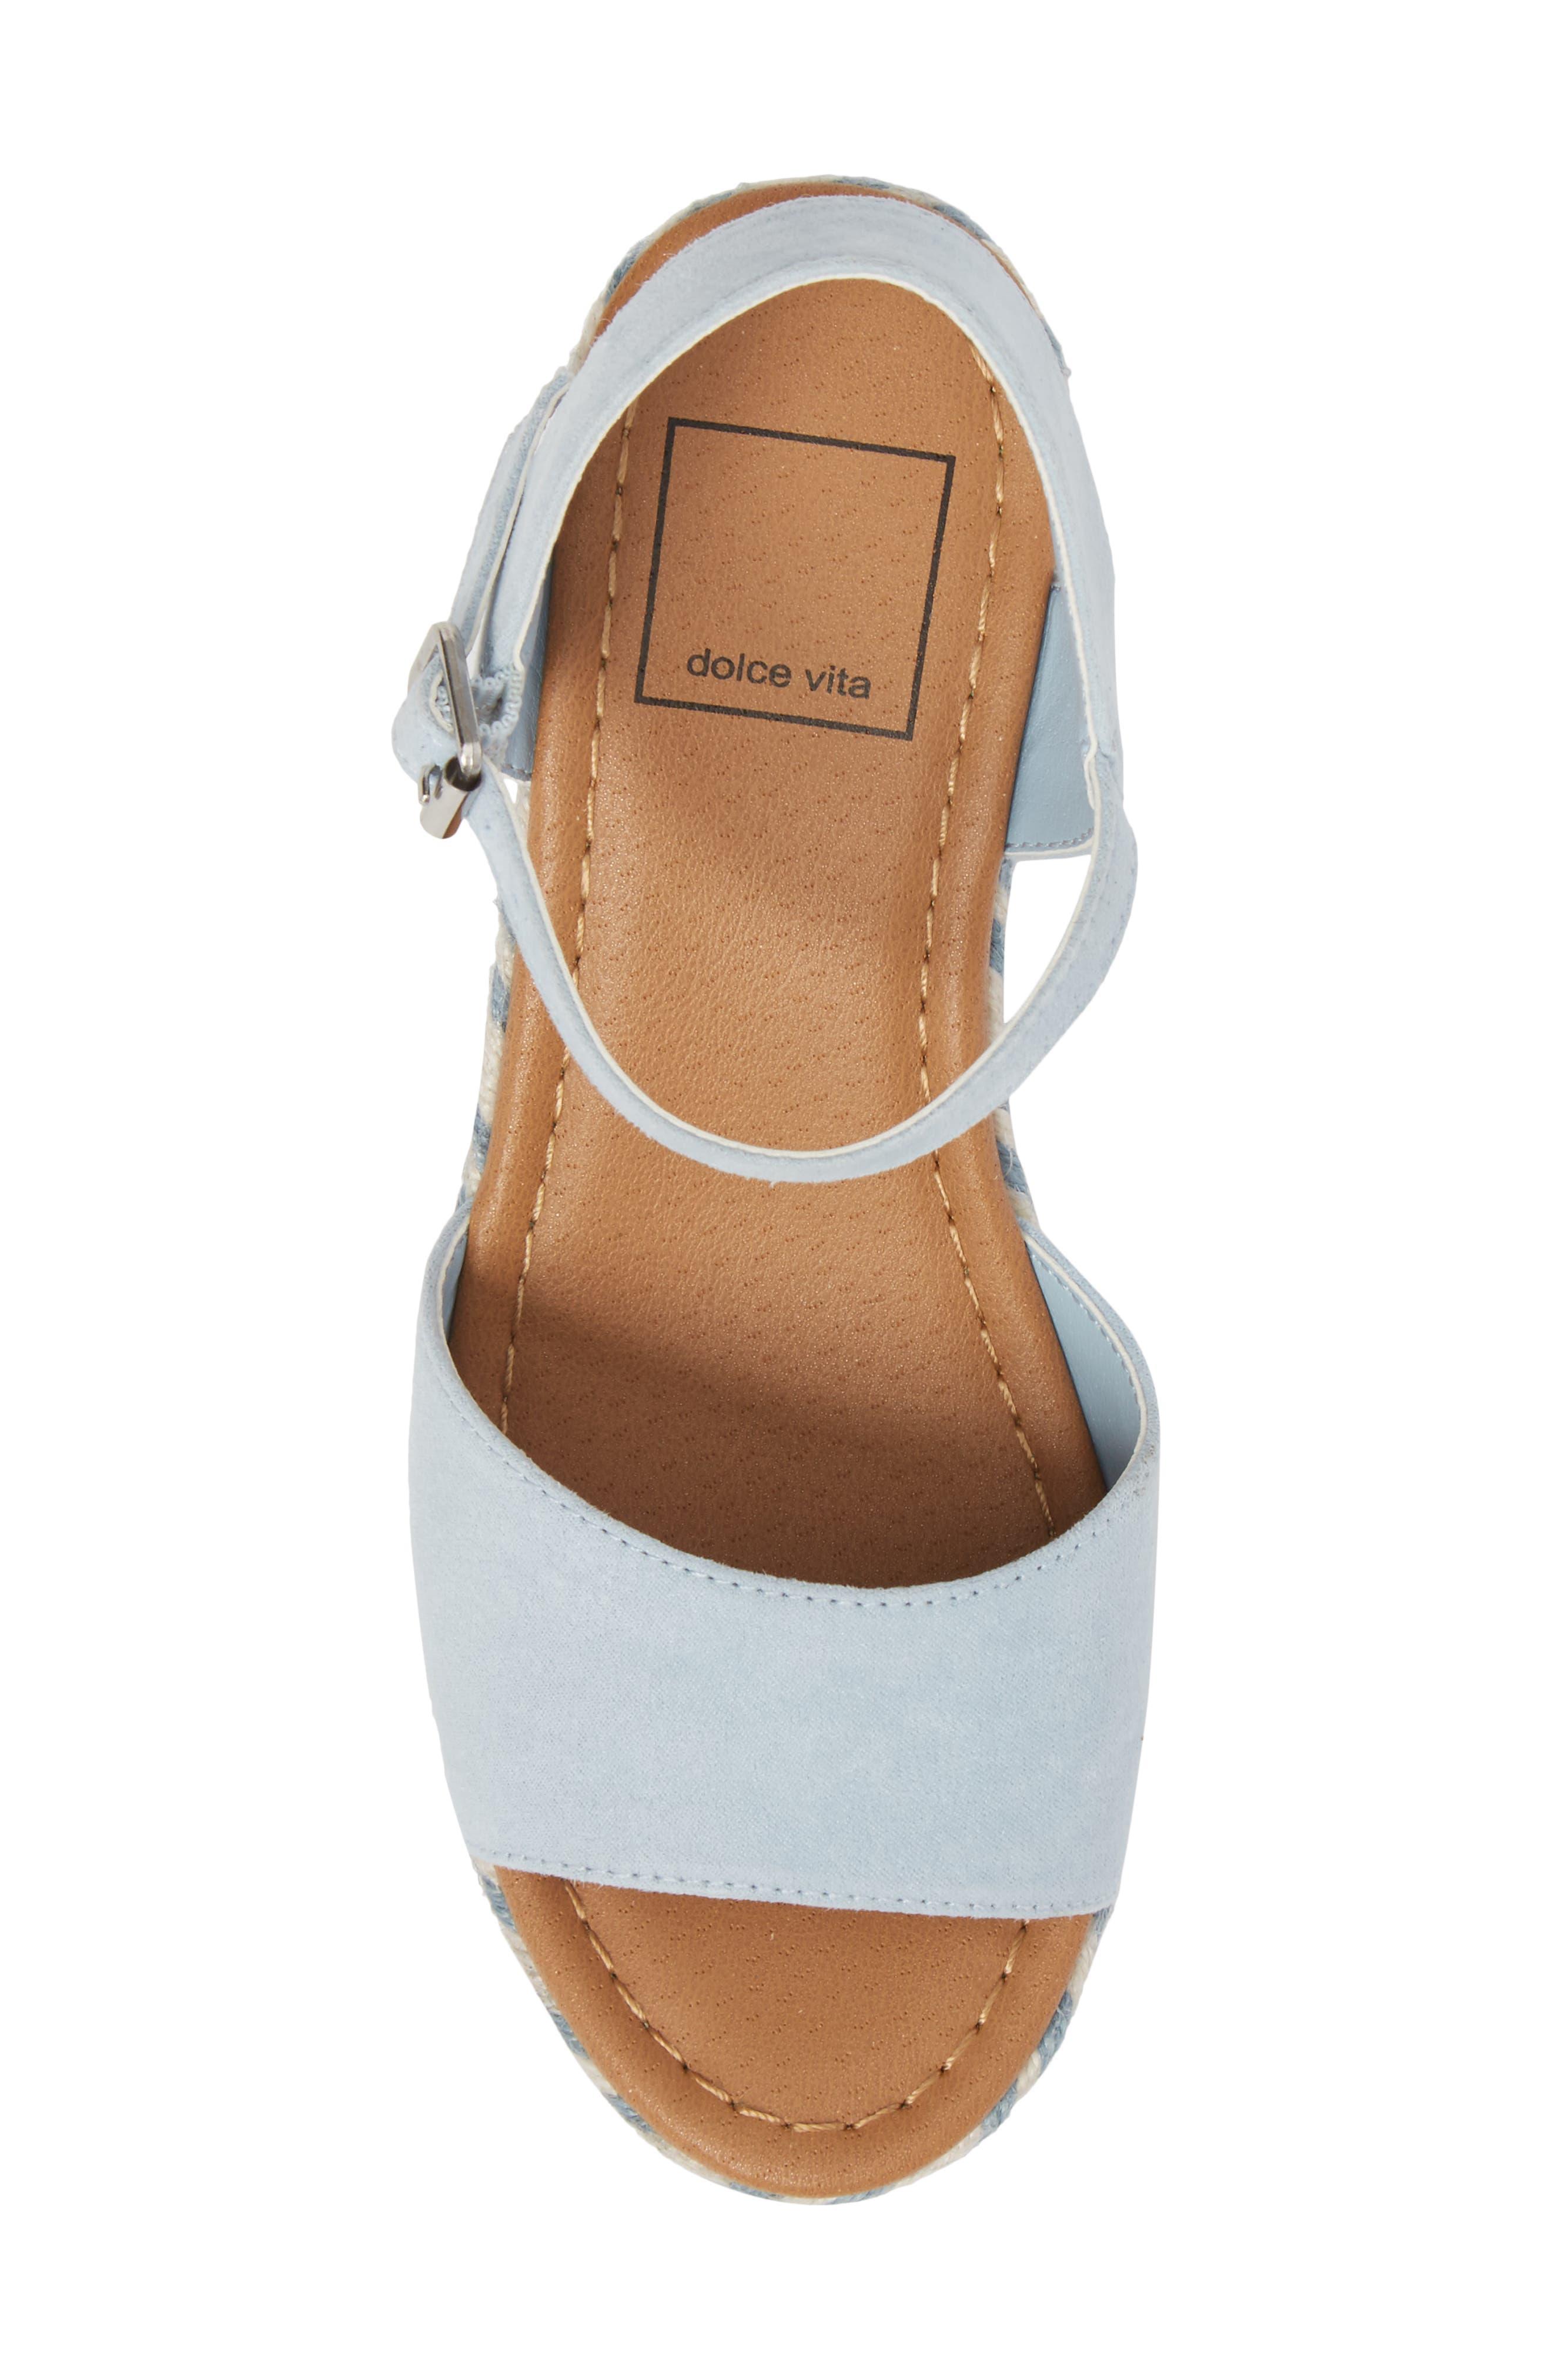 Wendy Espadrille Wedge Sandal,                             Alternate thumbnail 5, color,                             Light Blue